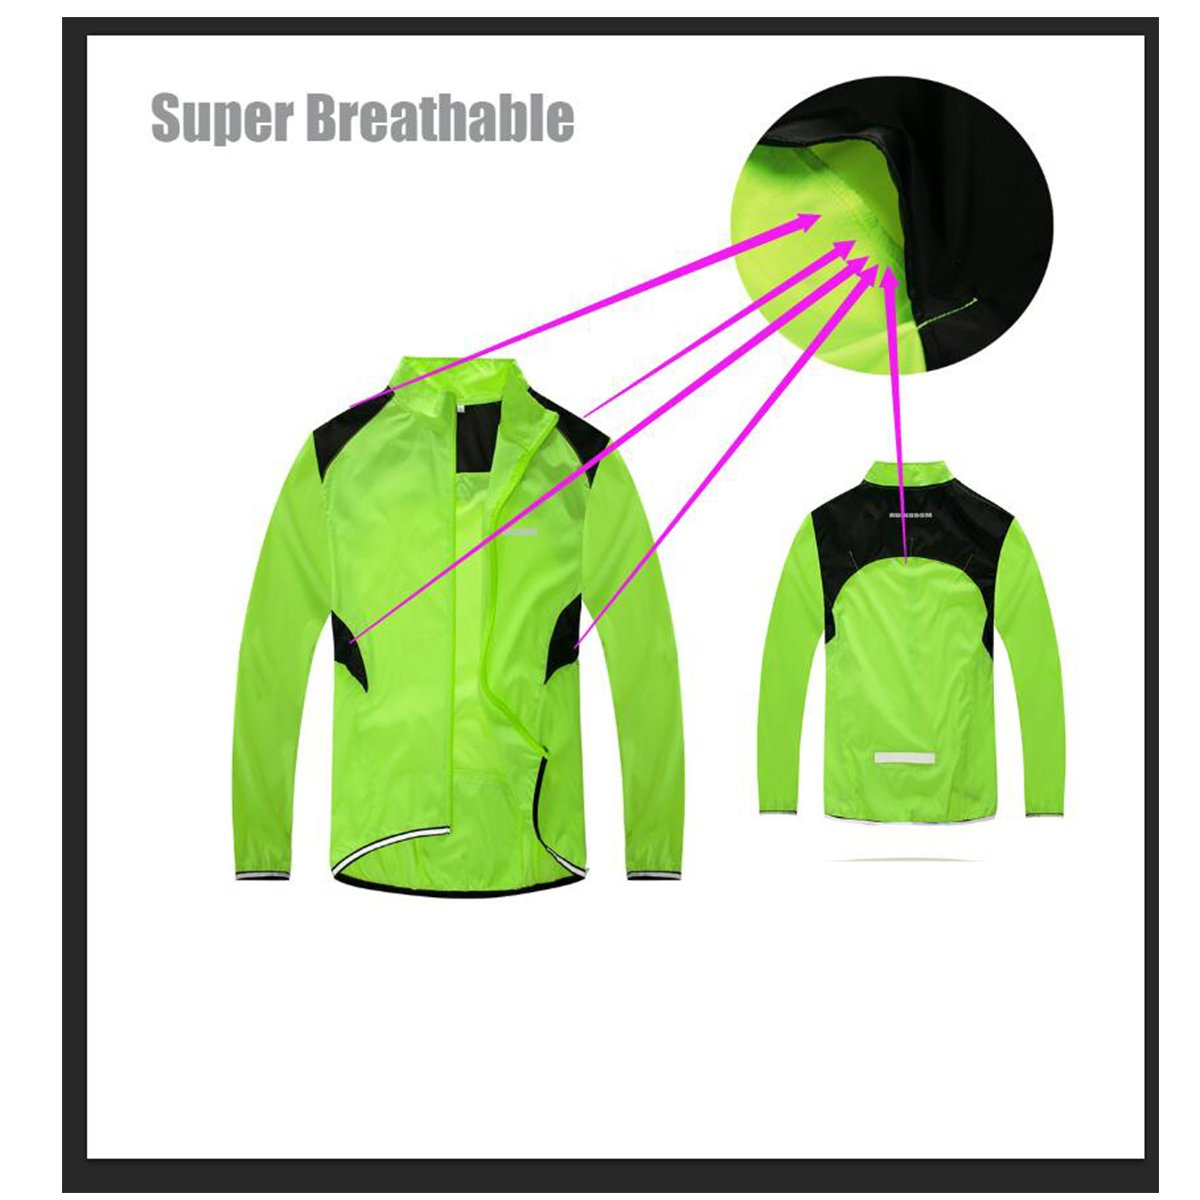 RUIKODOM Quick Dry Sports Jacket Cycling Running /& Walking High Visibility Reflective Mens Windproof Coat